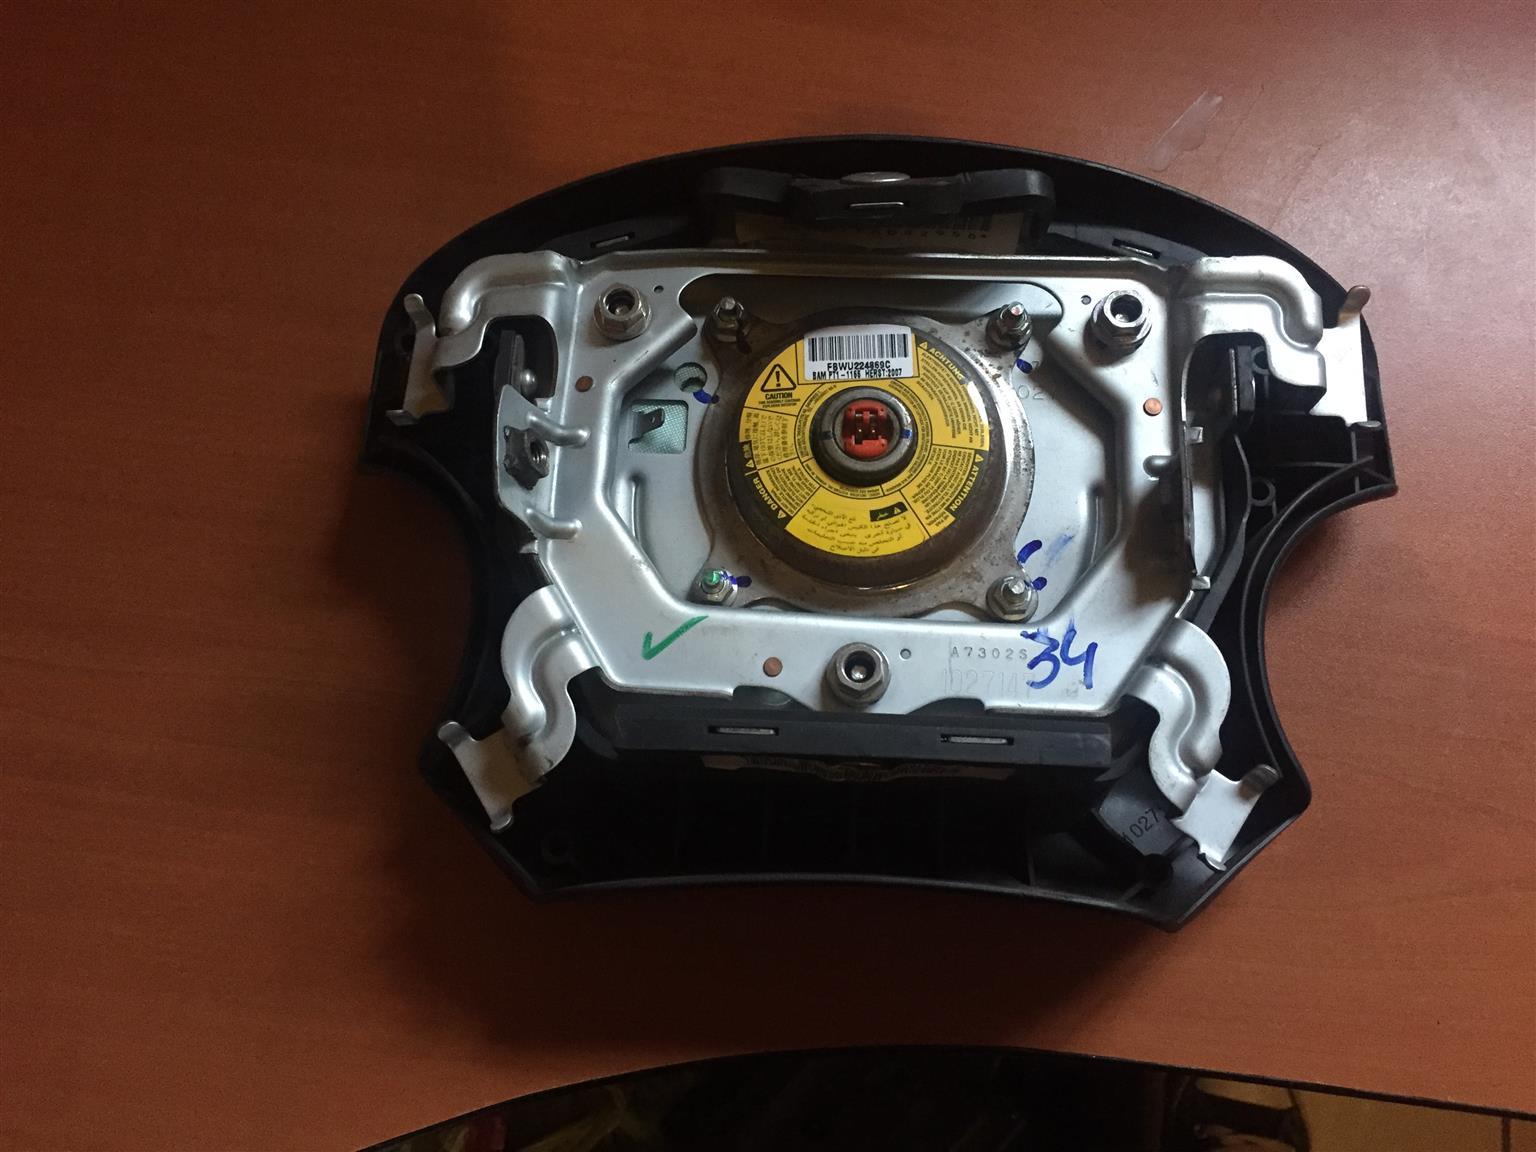 Toyota Quantum airbags for sale